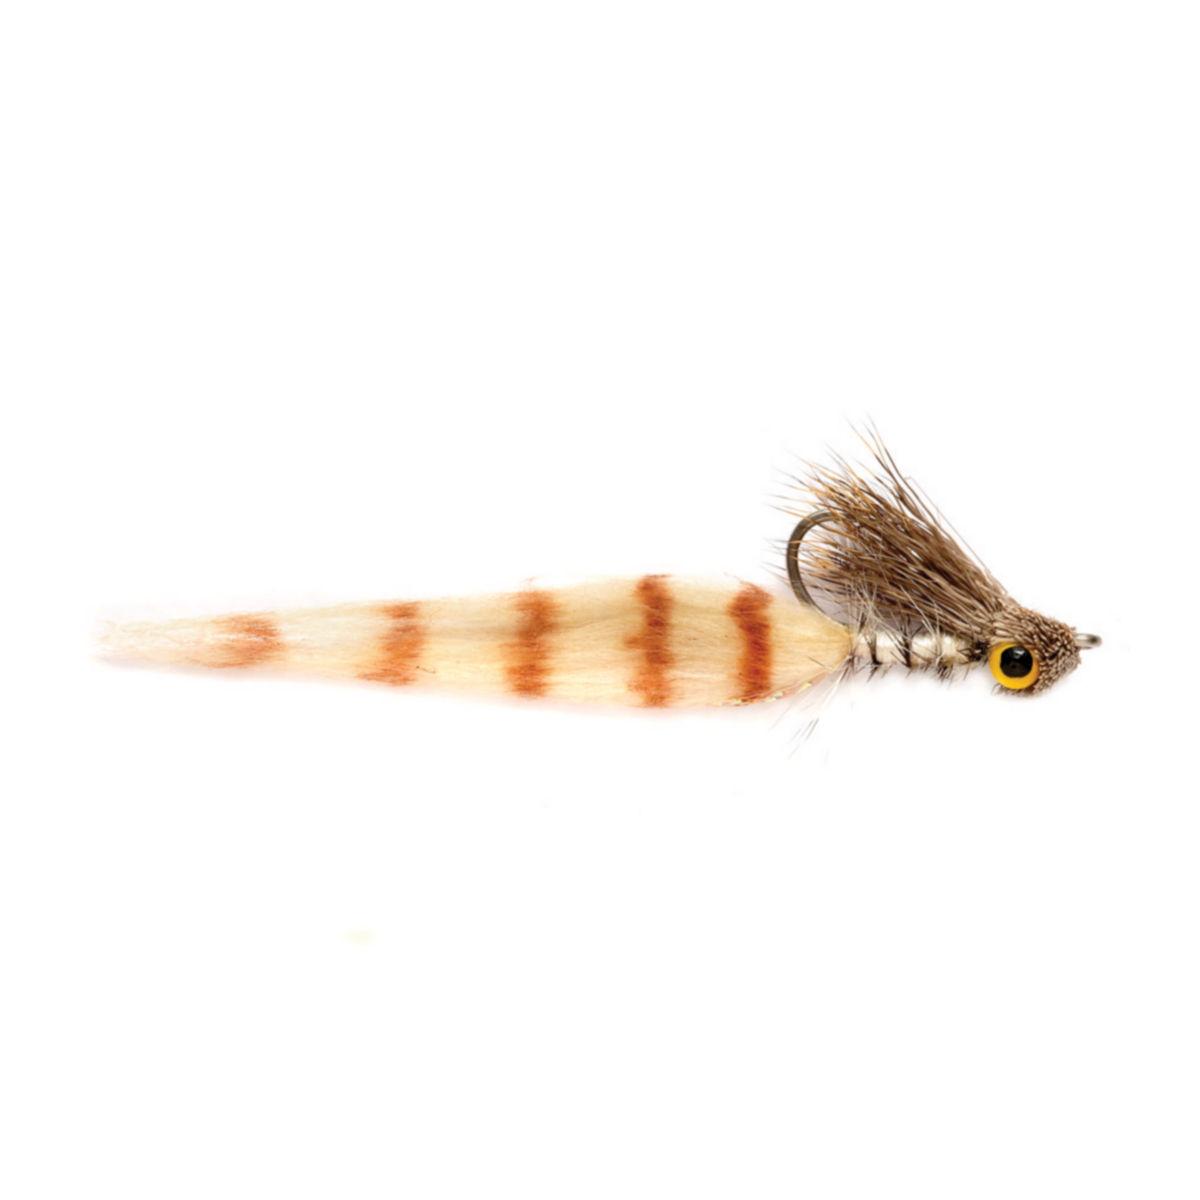 Borski Bonefish Slider - NATURALimage number 0